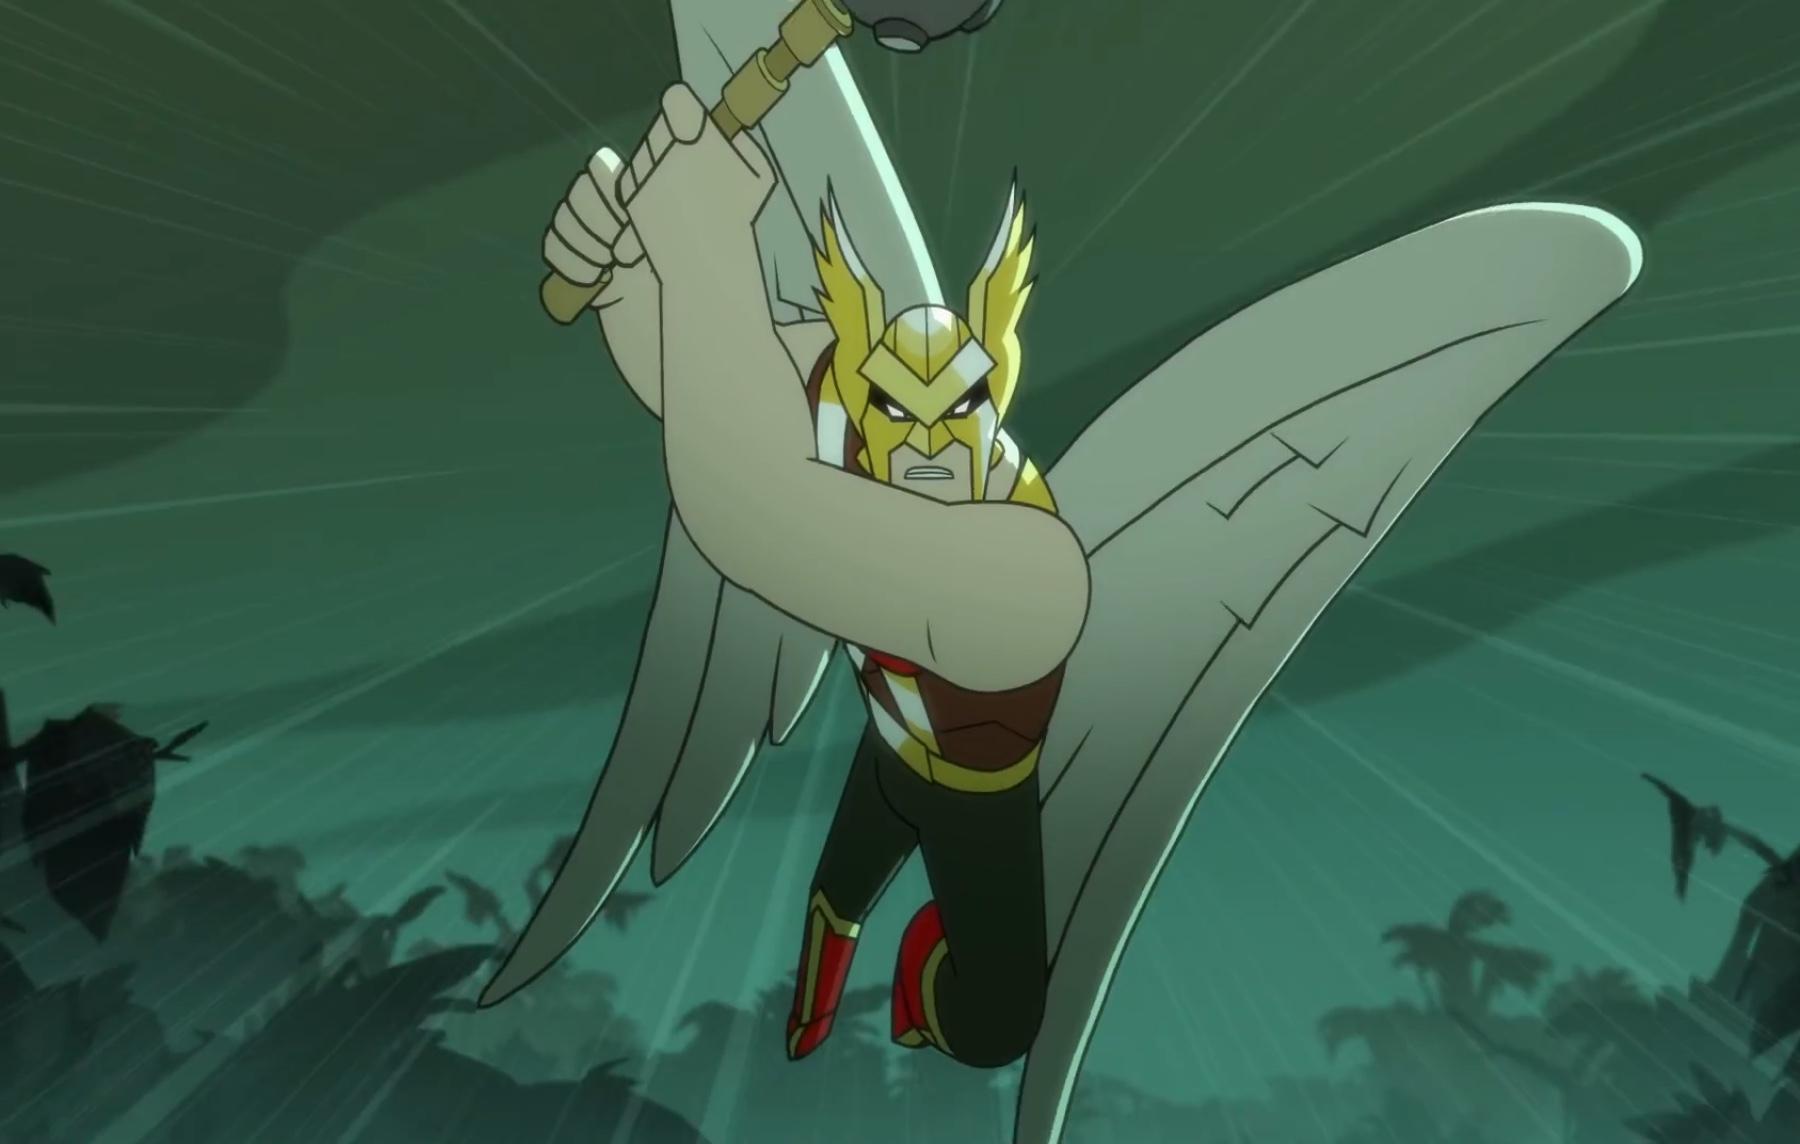 Katar Hol (DC Super Friends Web Series)